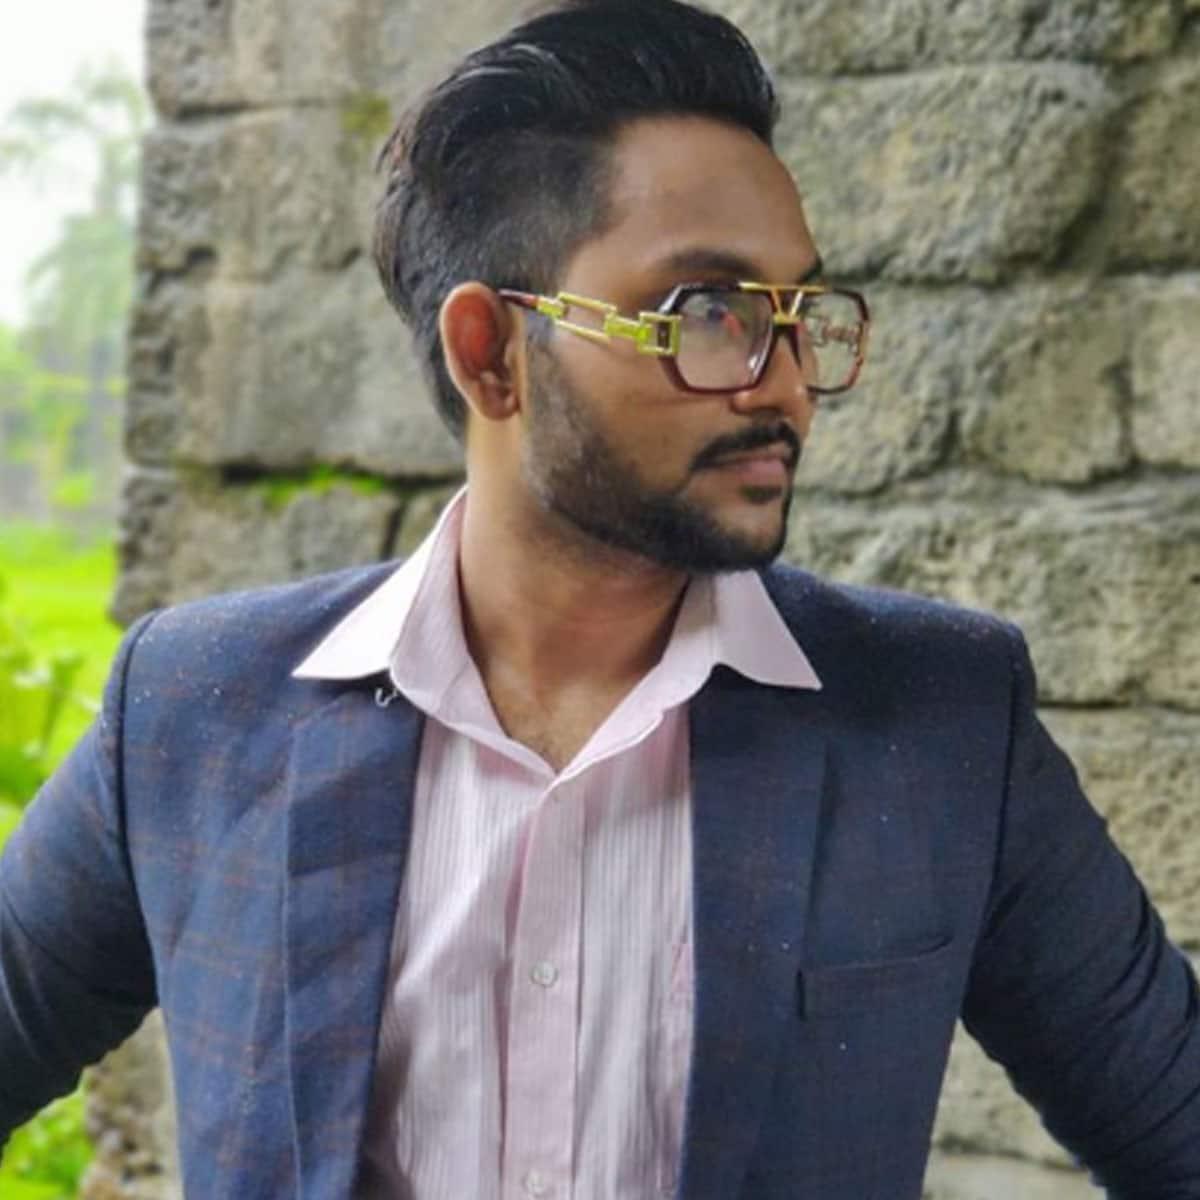 बिग बॉस 14: जान कुमार सानु हो जायेंगे घर से बाहर, रुबीना को मिली स्पेशल पॉवर